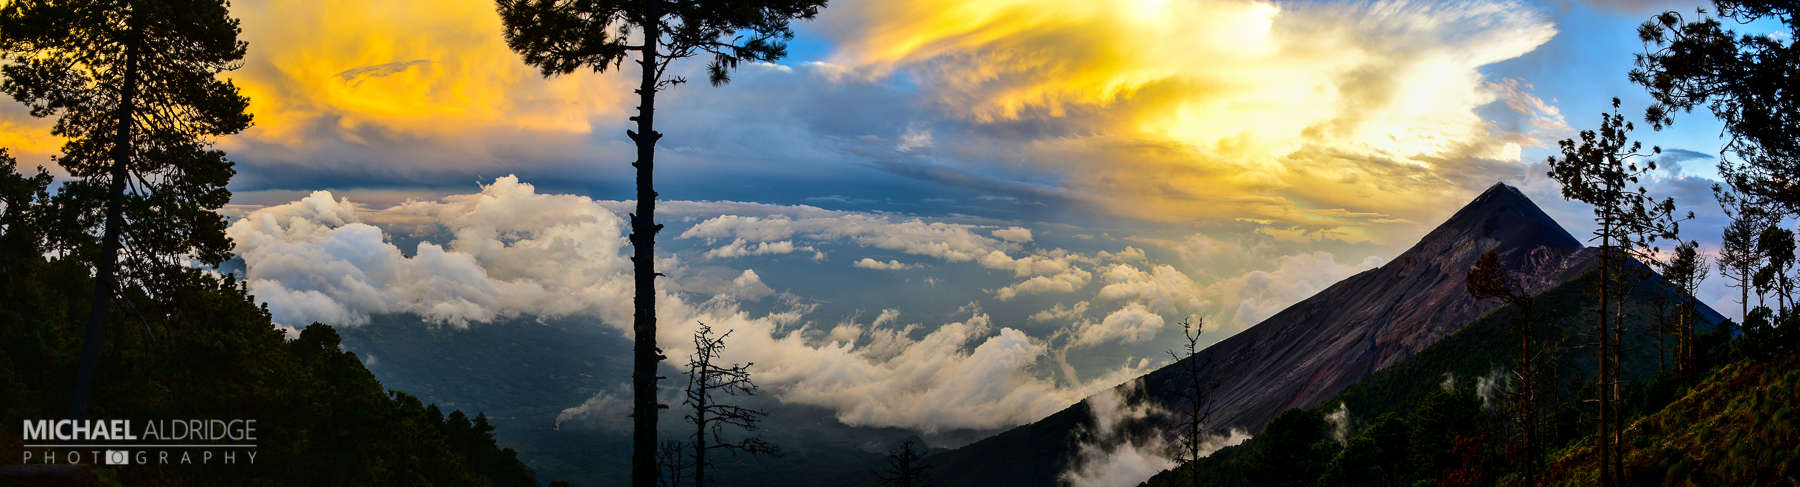 Sunset from Acatenango Volcano